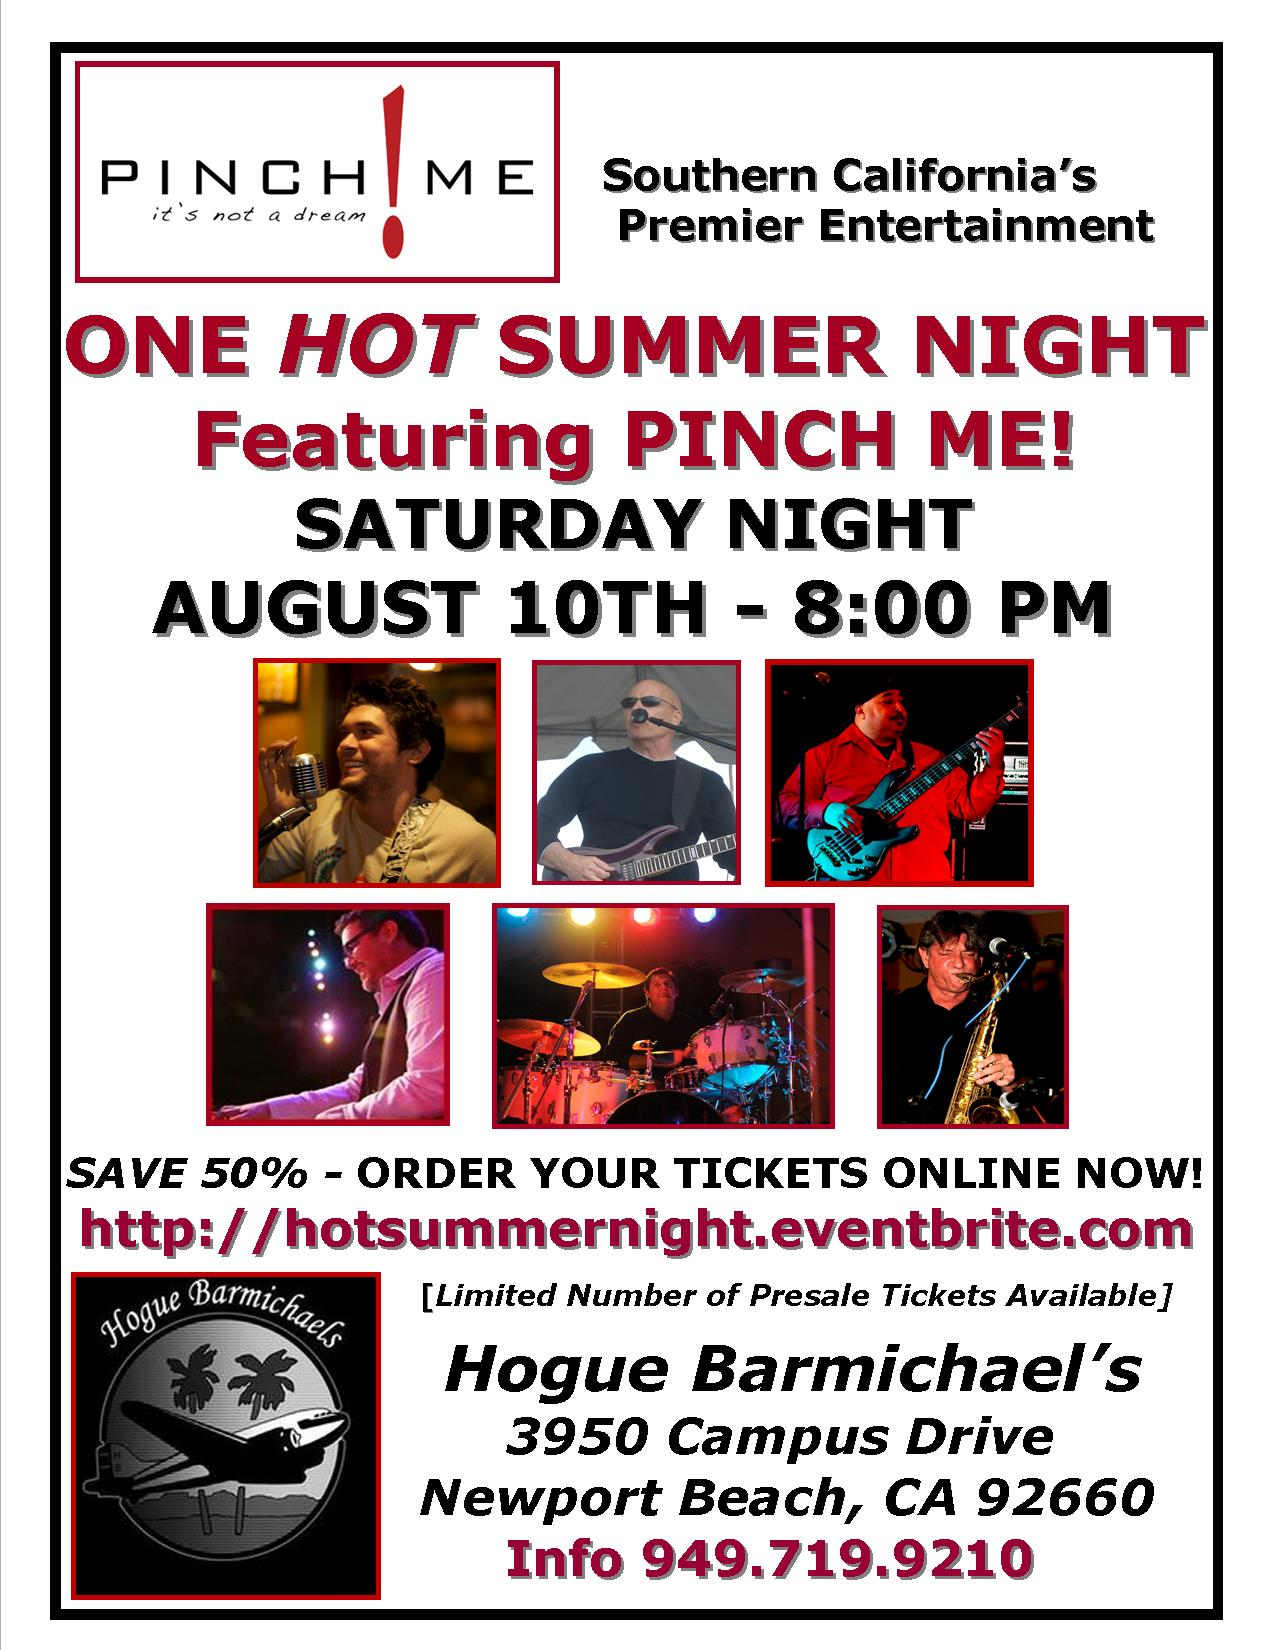 Hogue Barmaichael's Flyer 8-10-13